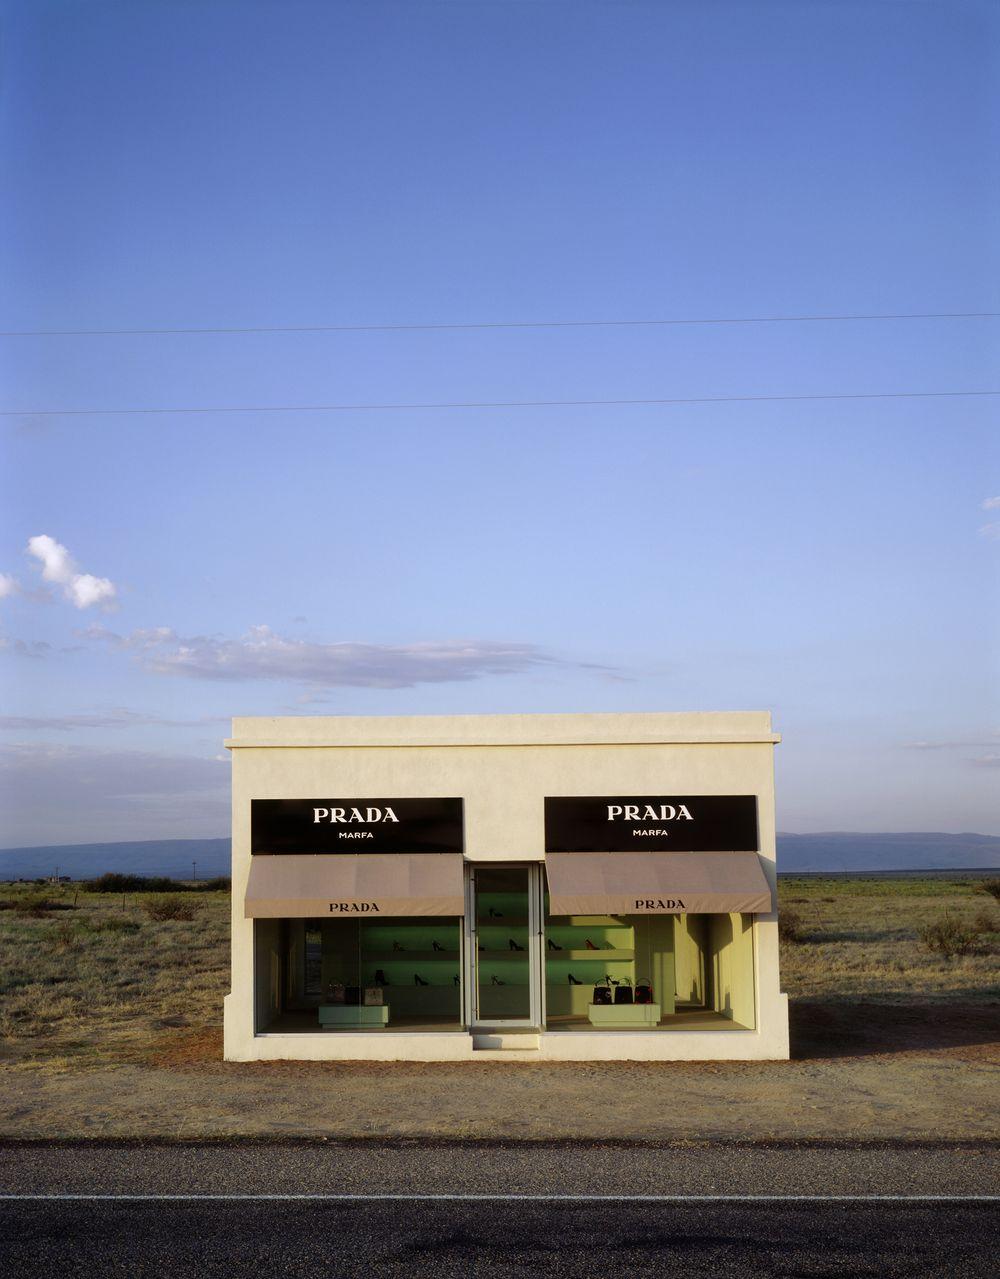 Artist:Elmgreen & Dragset, Exhibition:Prada Marfa